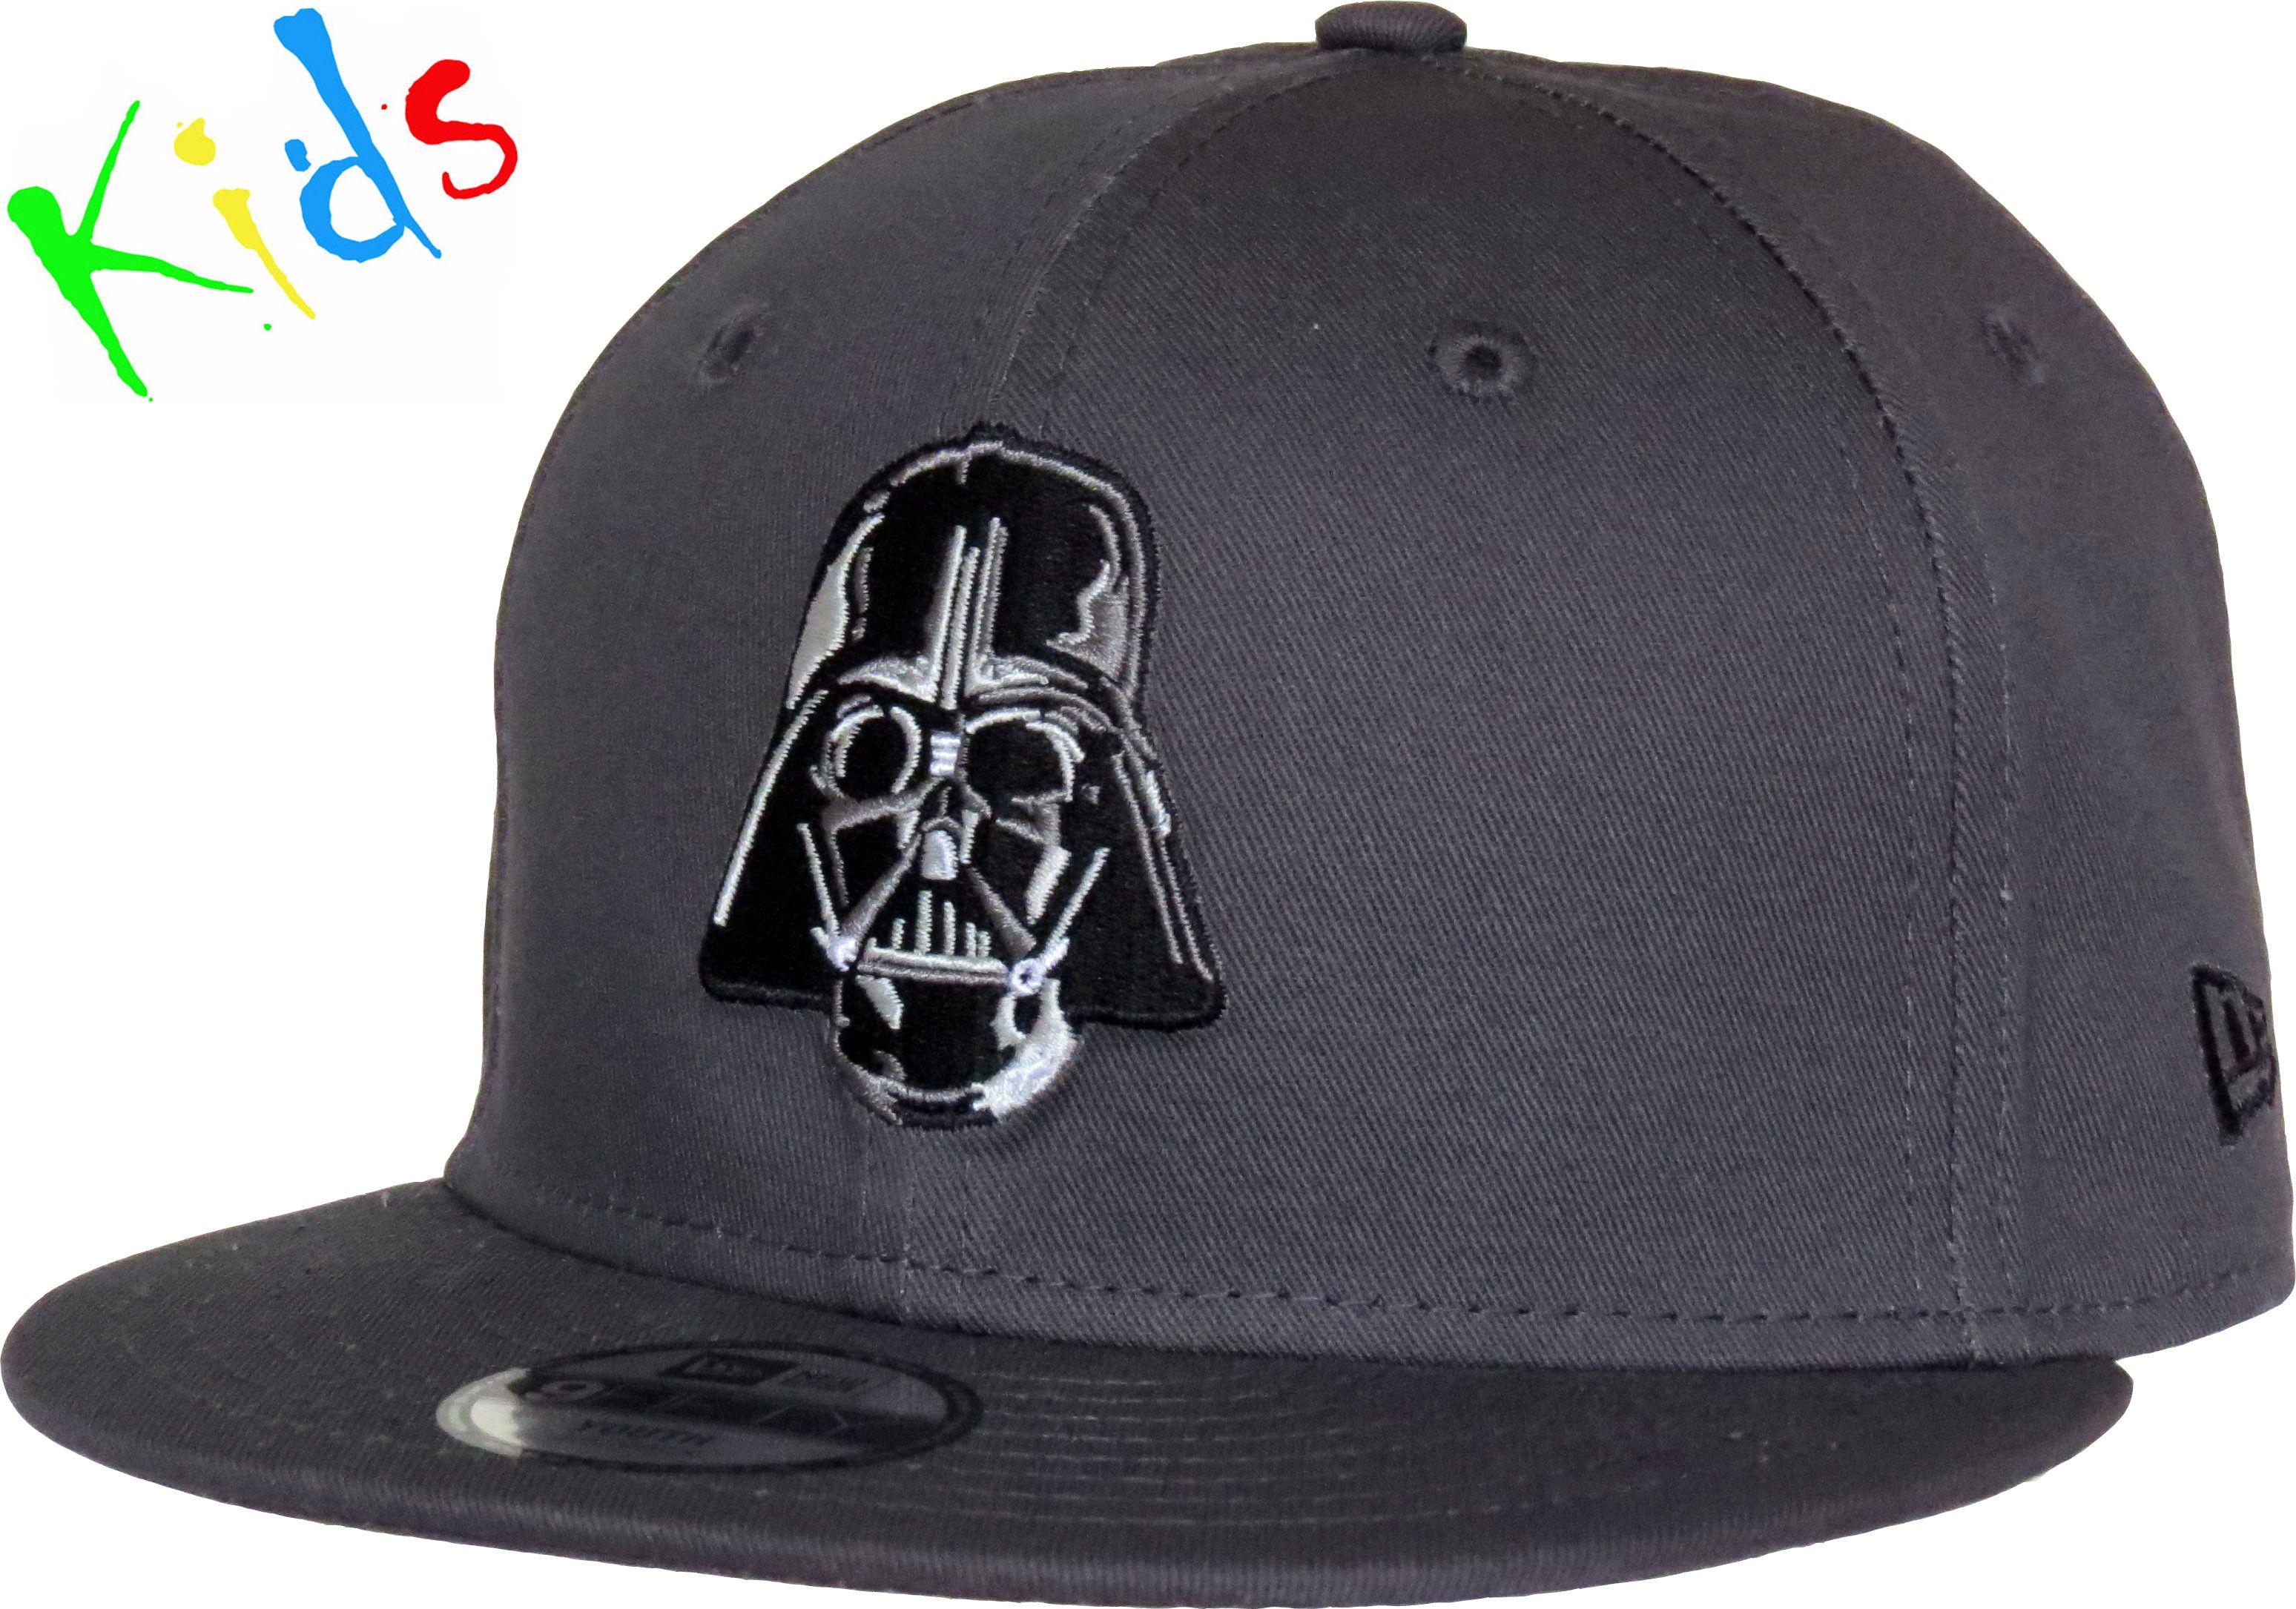 New Era Kids 9Fifty Star wars Essential Snapback Cap. Dark Grey with the Darth  Vader 57abd320cb64